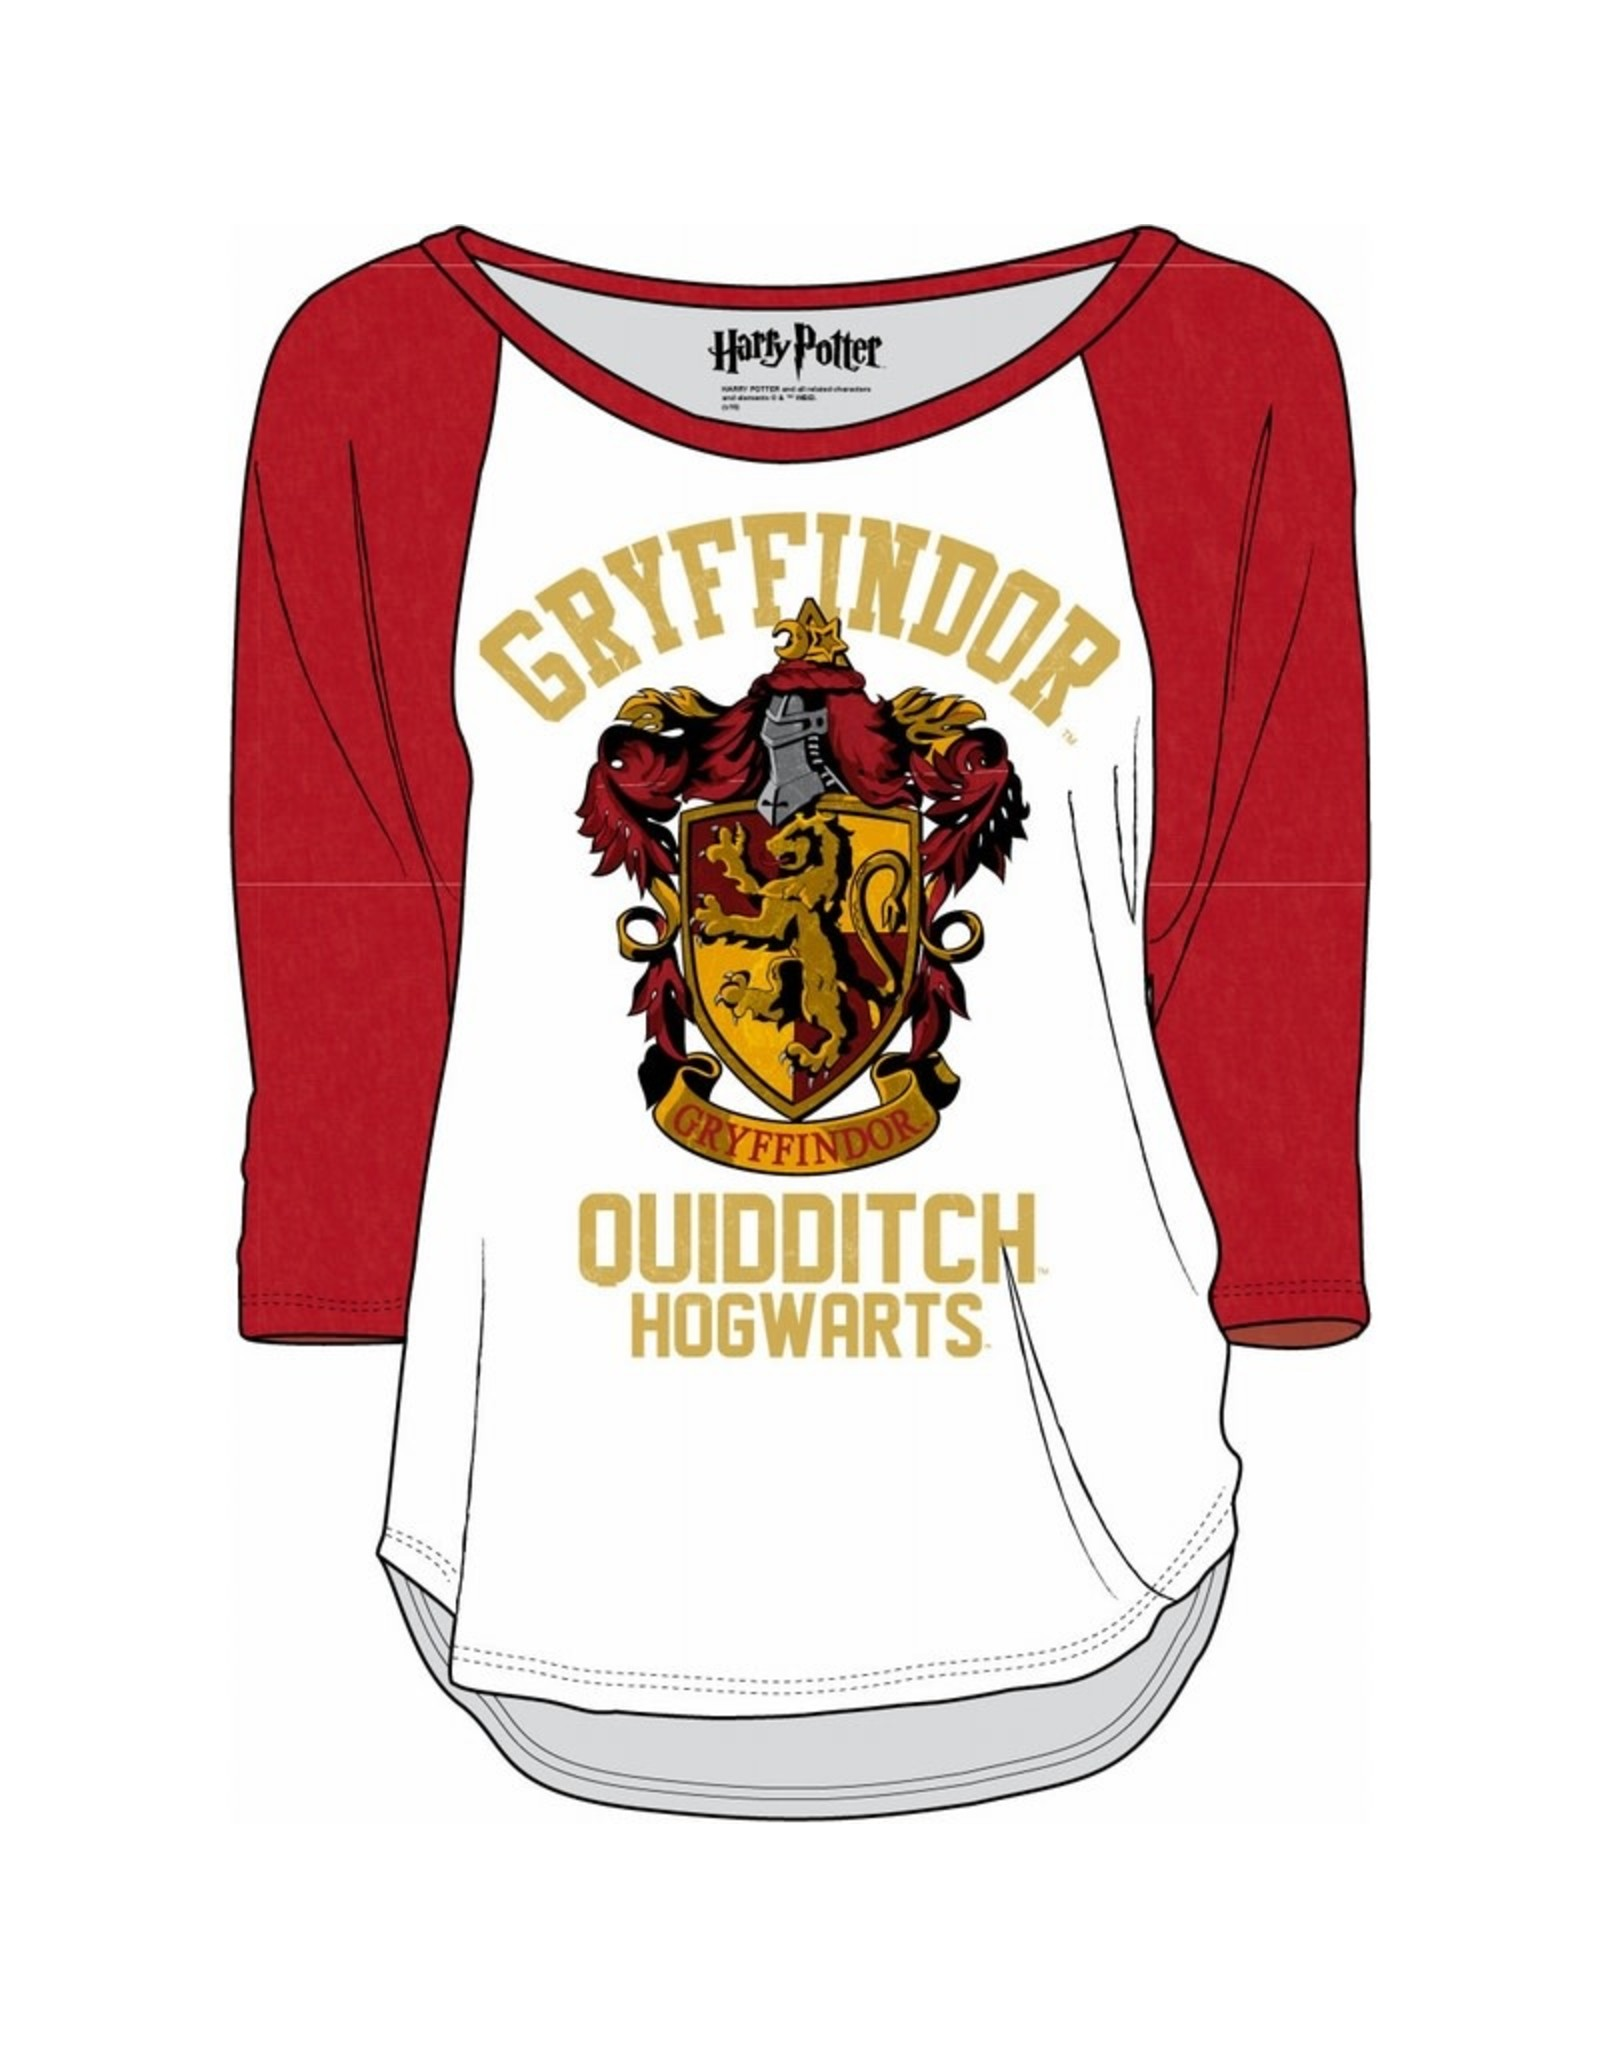 HARRY POTTER - T-Shirt Griffindor Quidditch - Blanc / Rouge (XL)